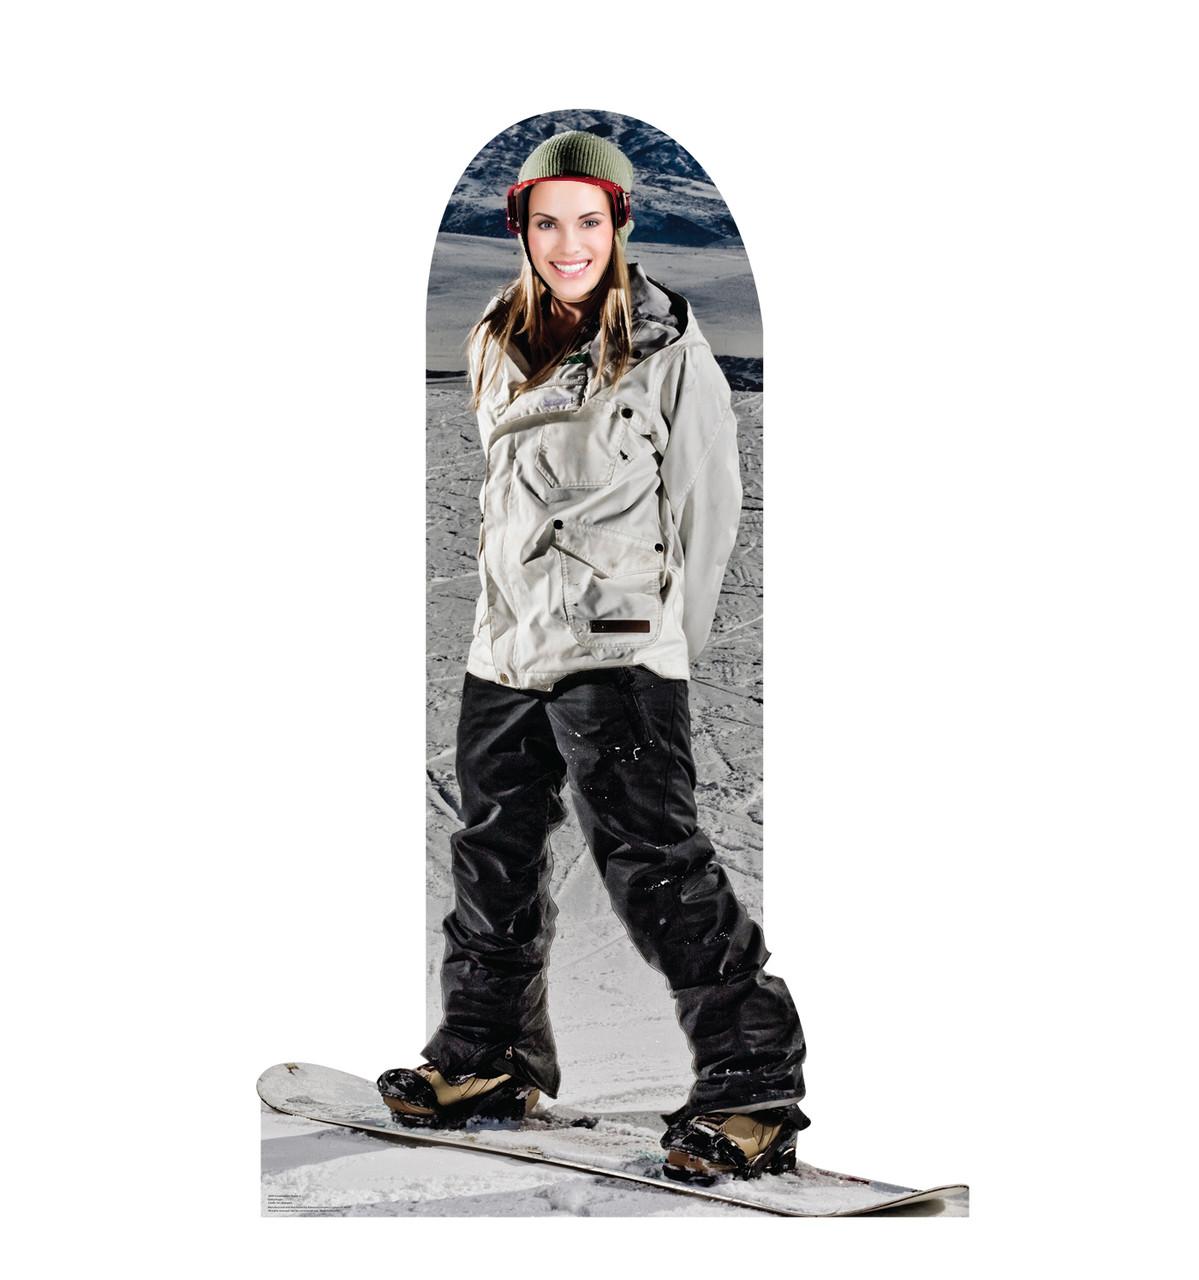 Snowboarding Standin Cardboard Cutout